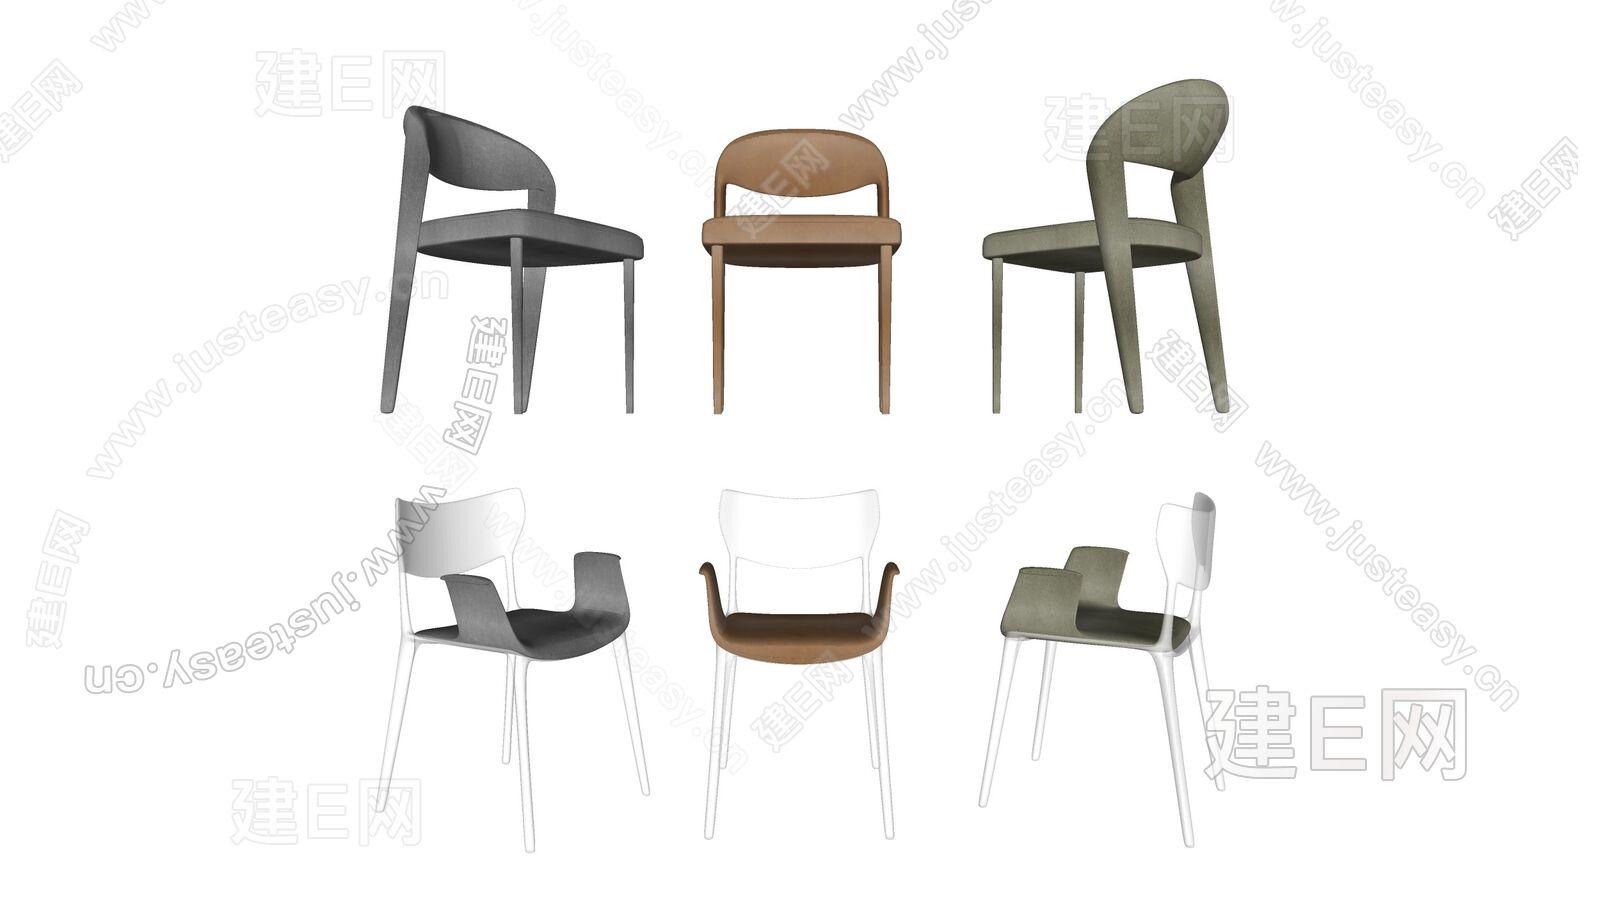 现代单椅组合sketchup模型